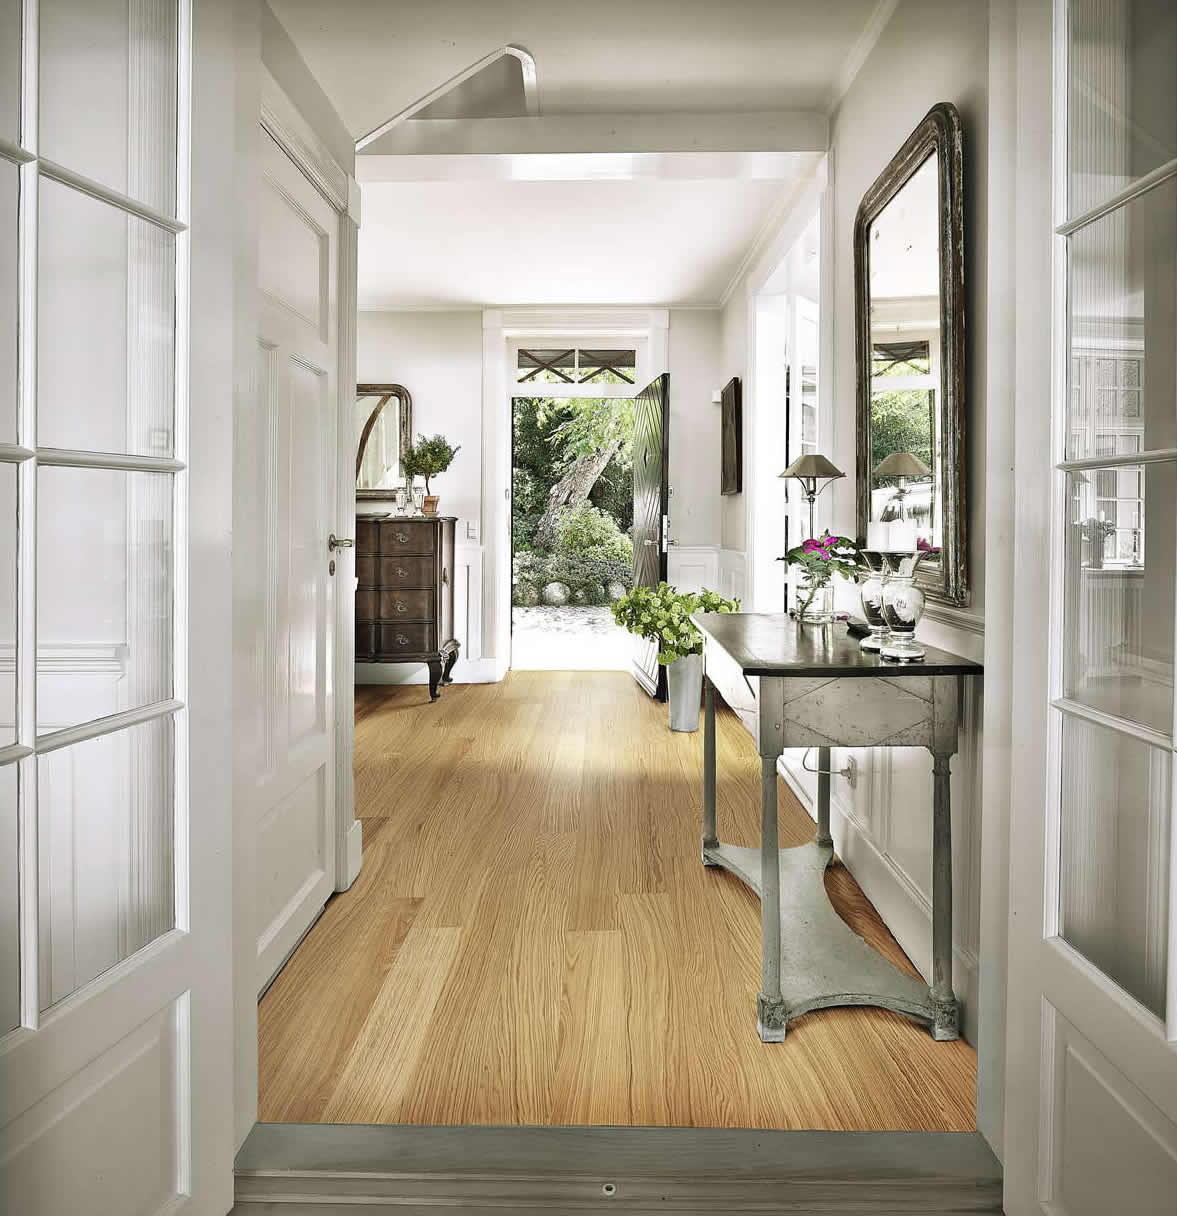 Kahrs linnea oak tower for Idee amenagement interieur maison